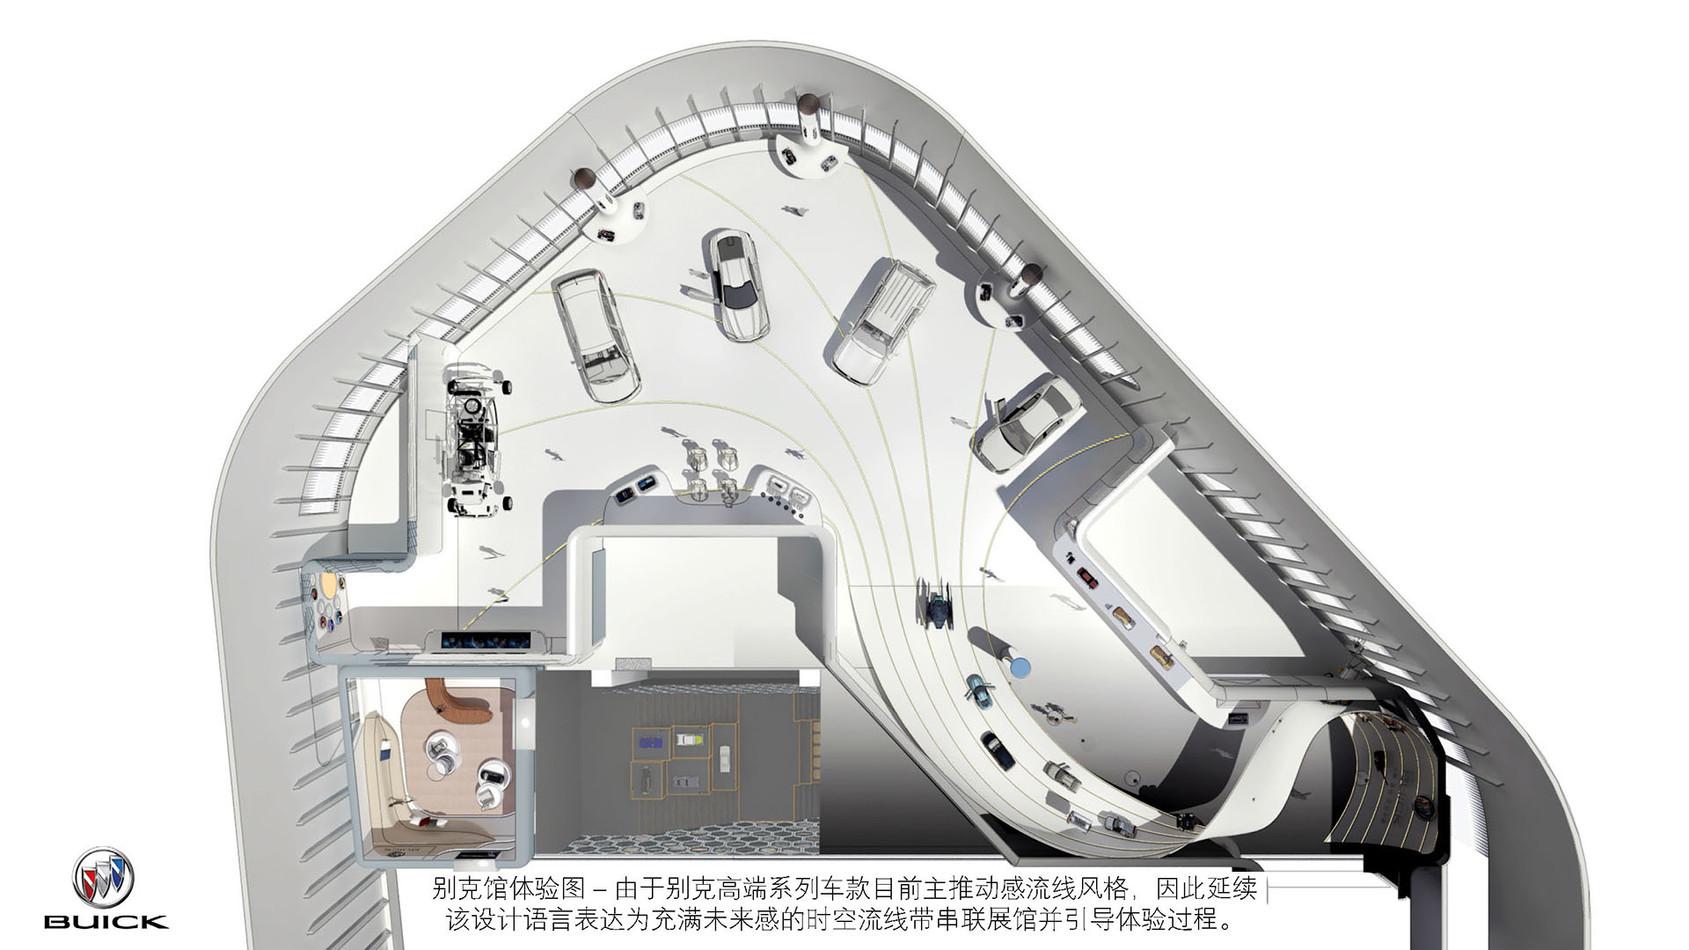 SGM-CORPORATE-MUSEUM-ZH 31.jpg